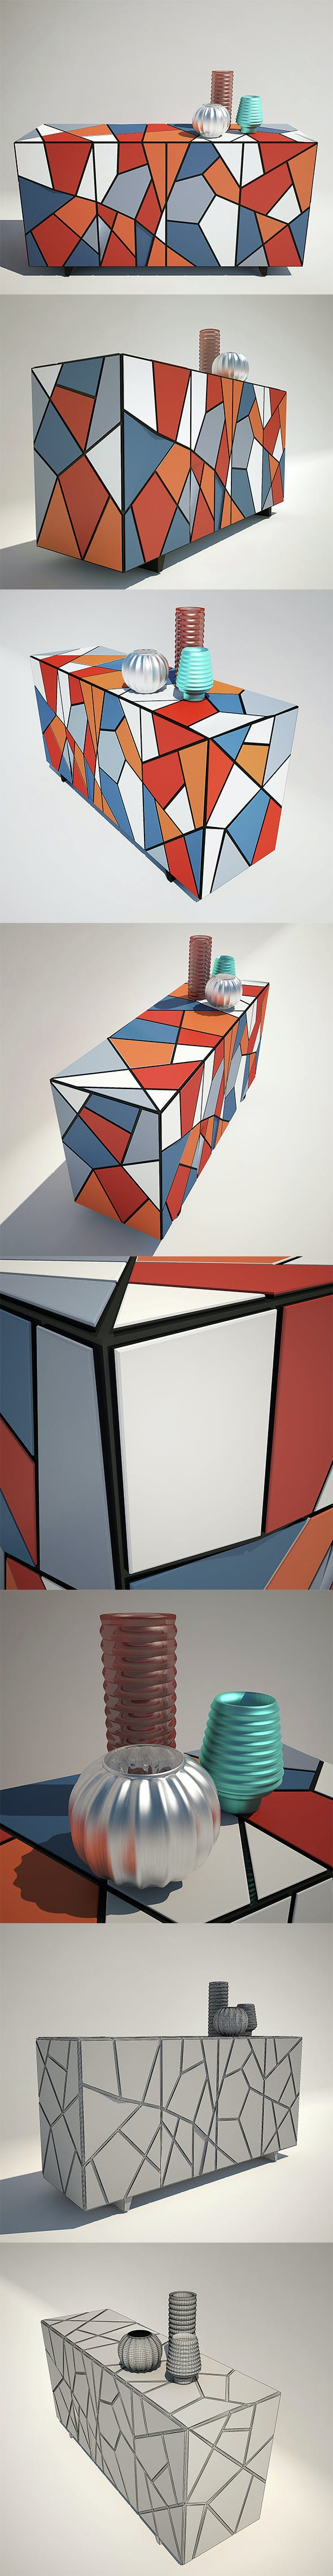 Chest Kare Design - 3DOcean Item for Sale